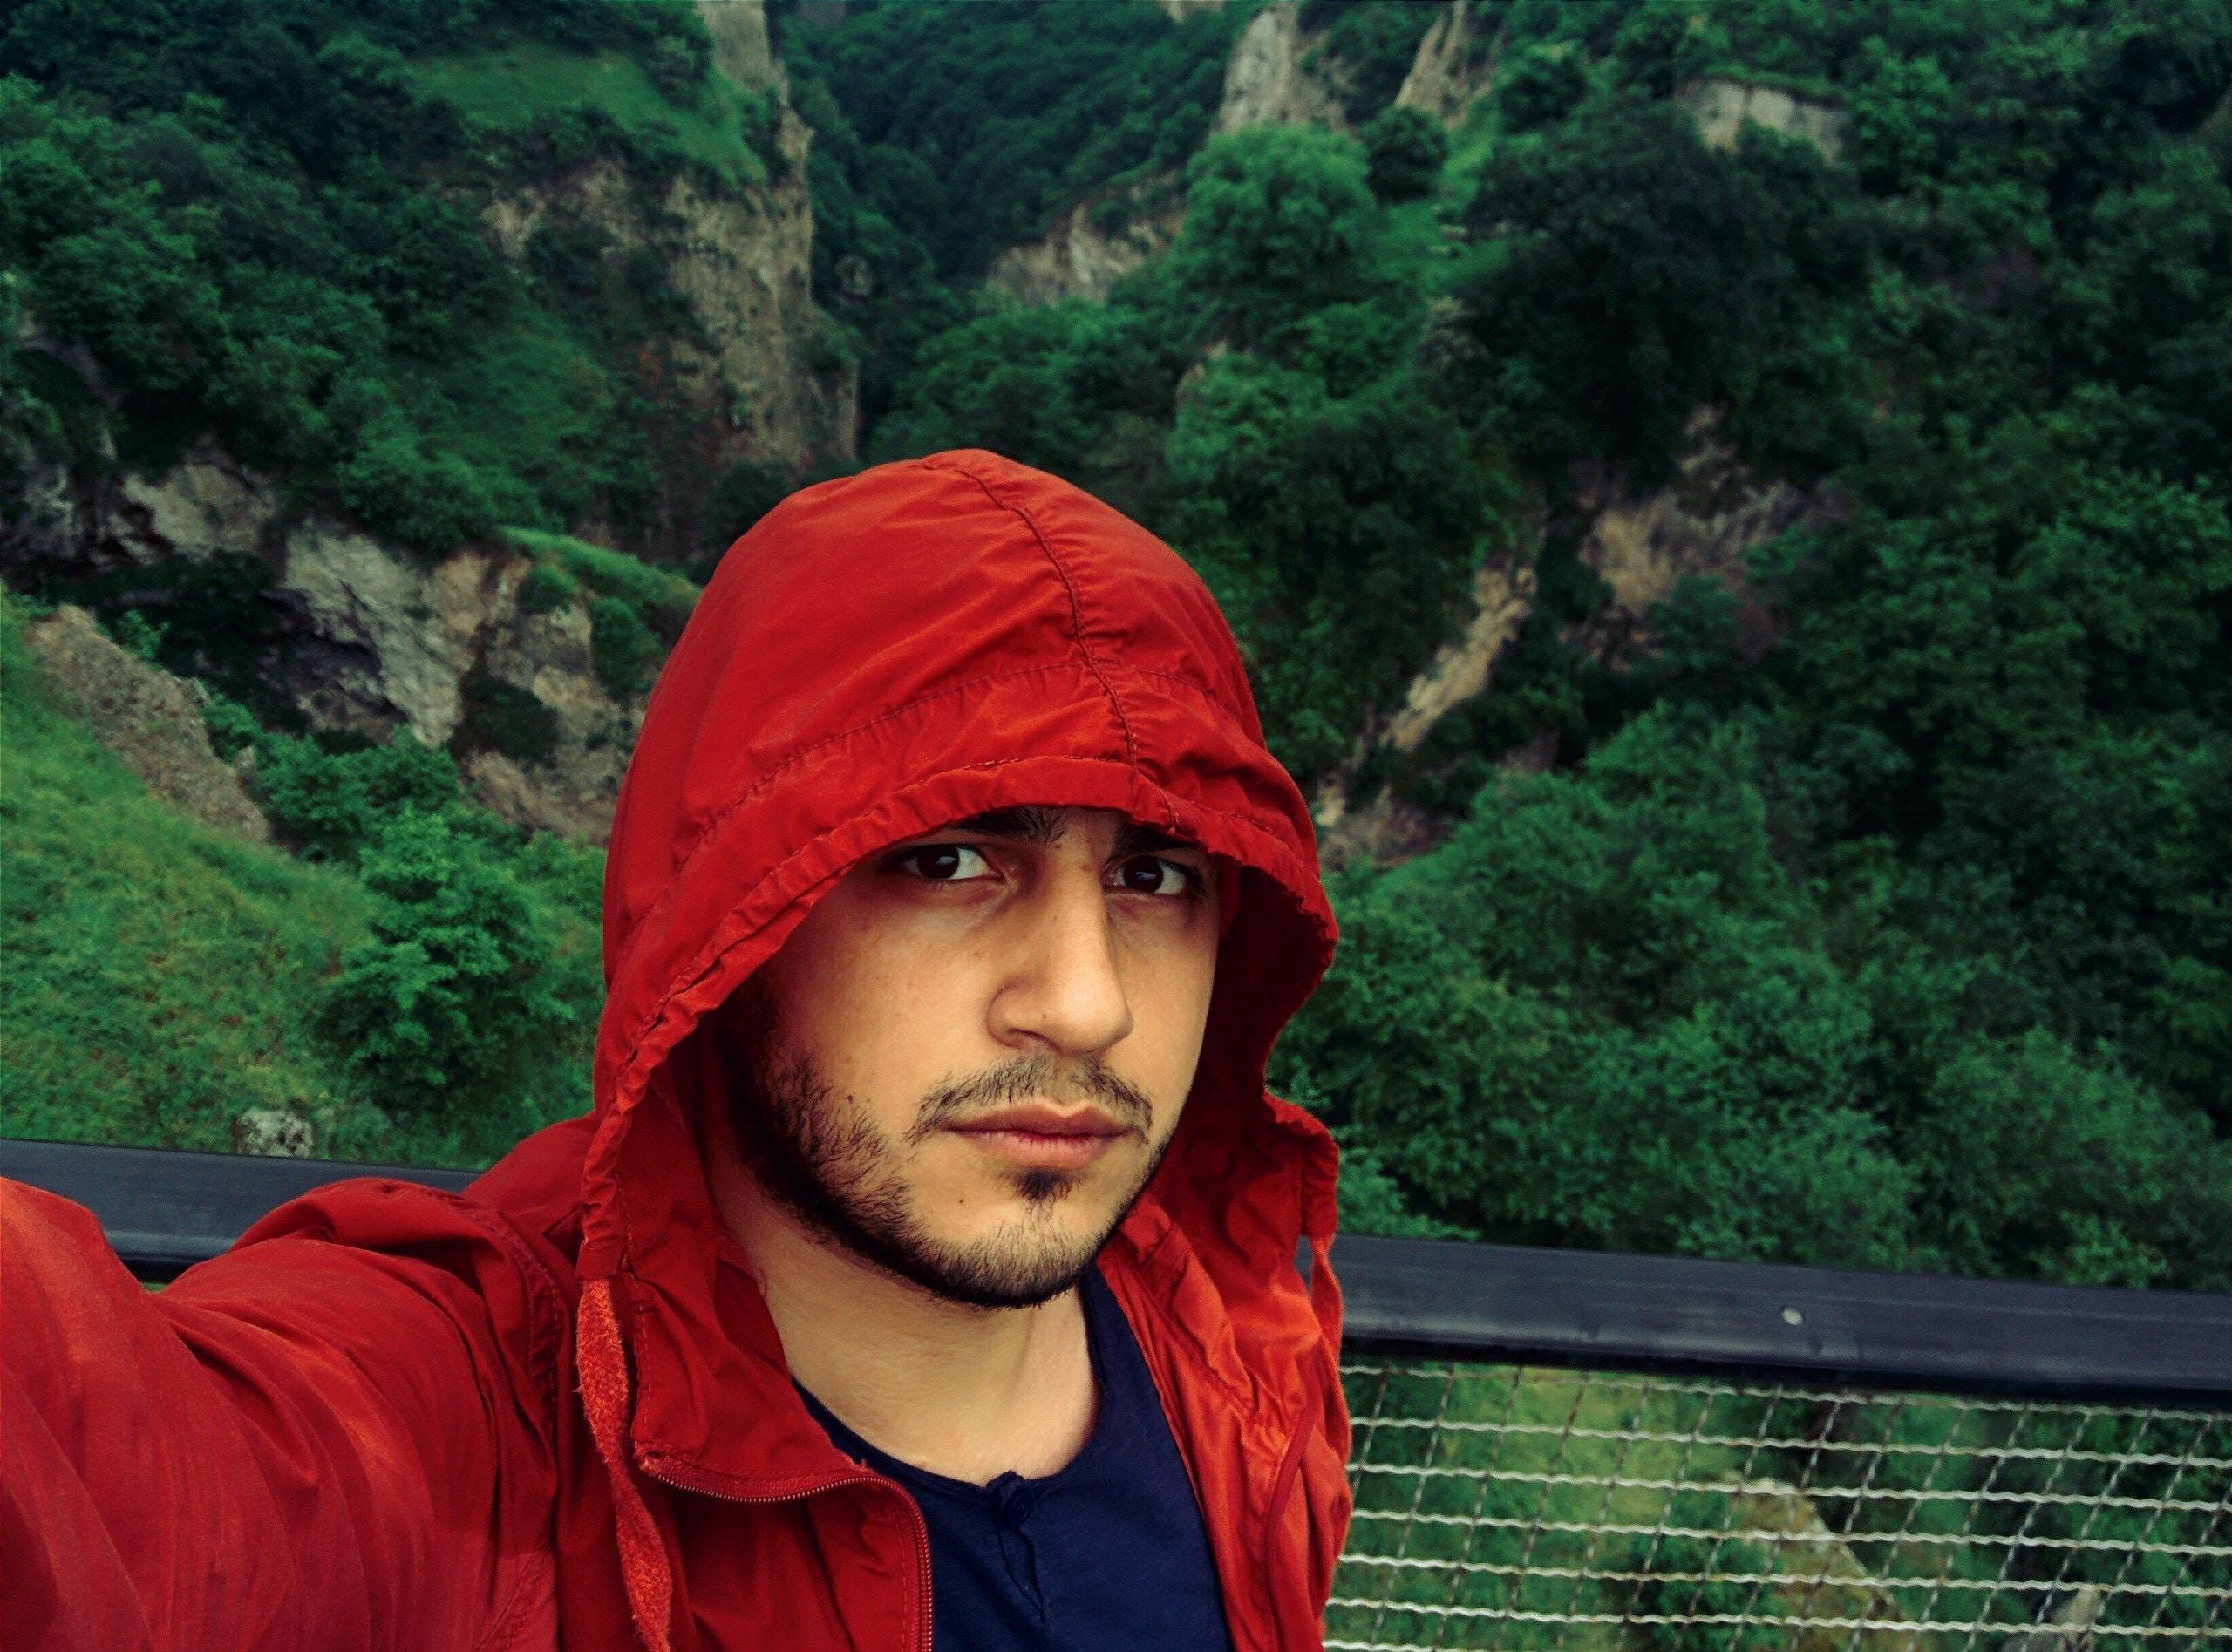 Go to Gor Davtyan's profile